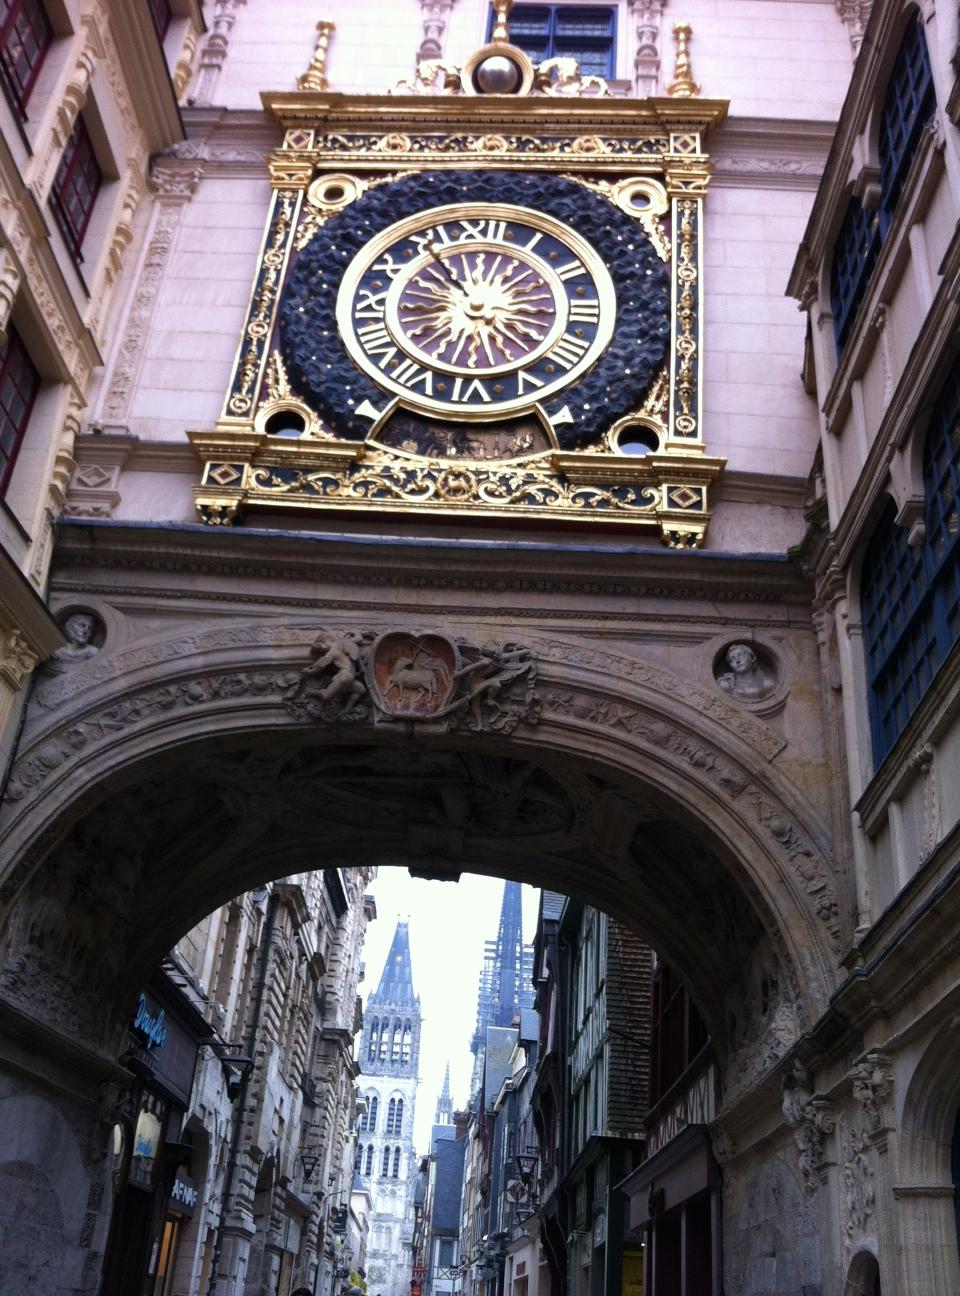 Gros horloge 2